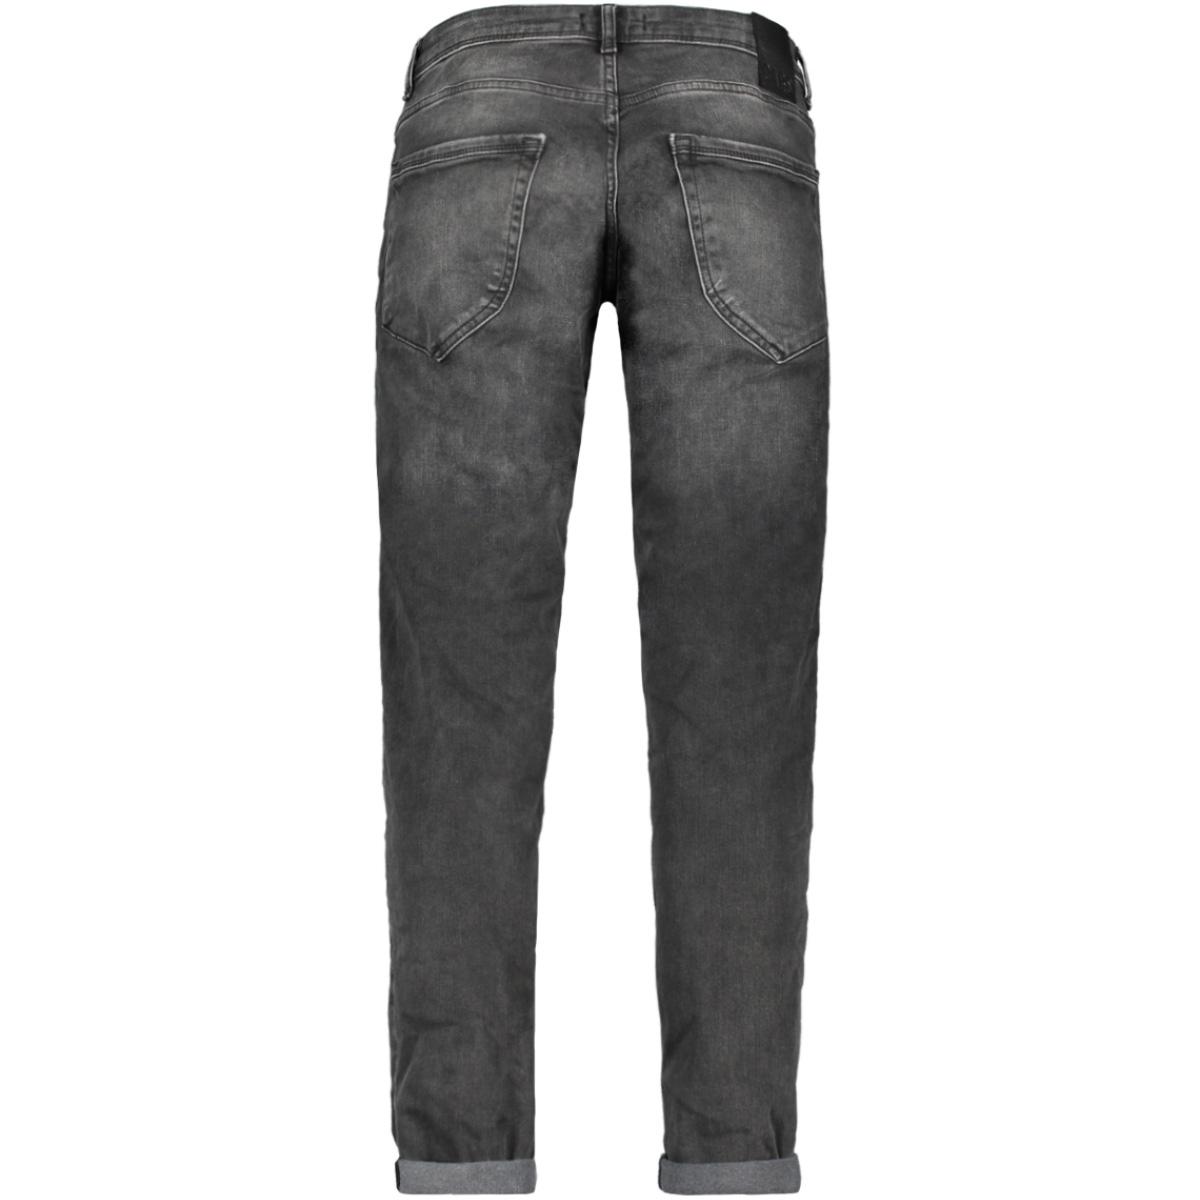 throne denim 7222841 cars jeans black used